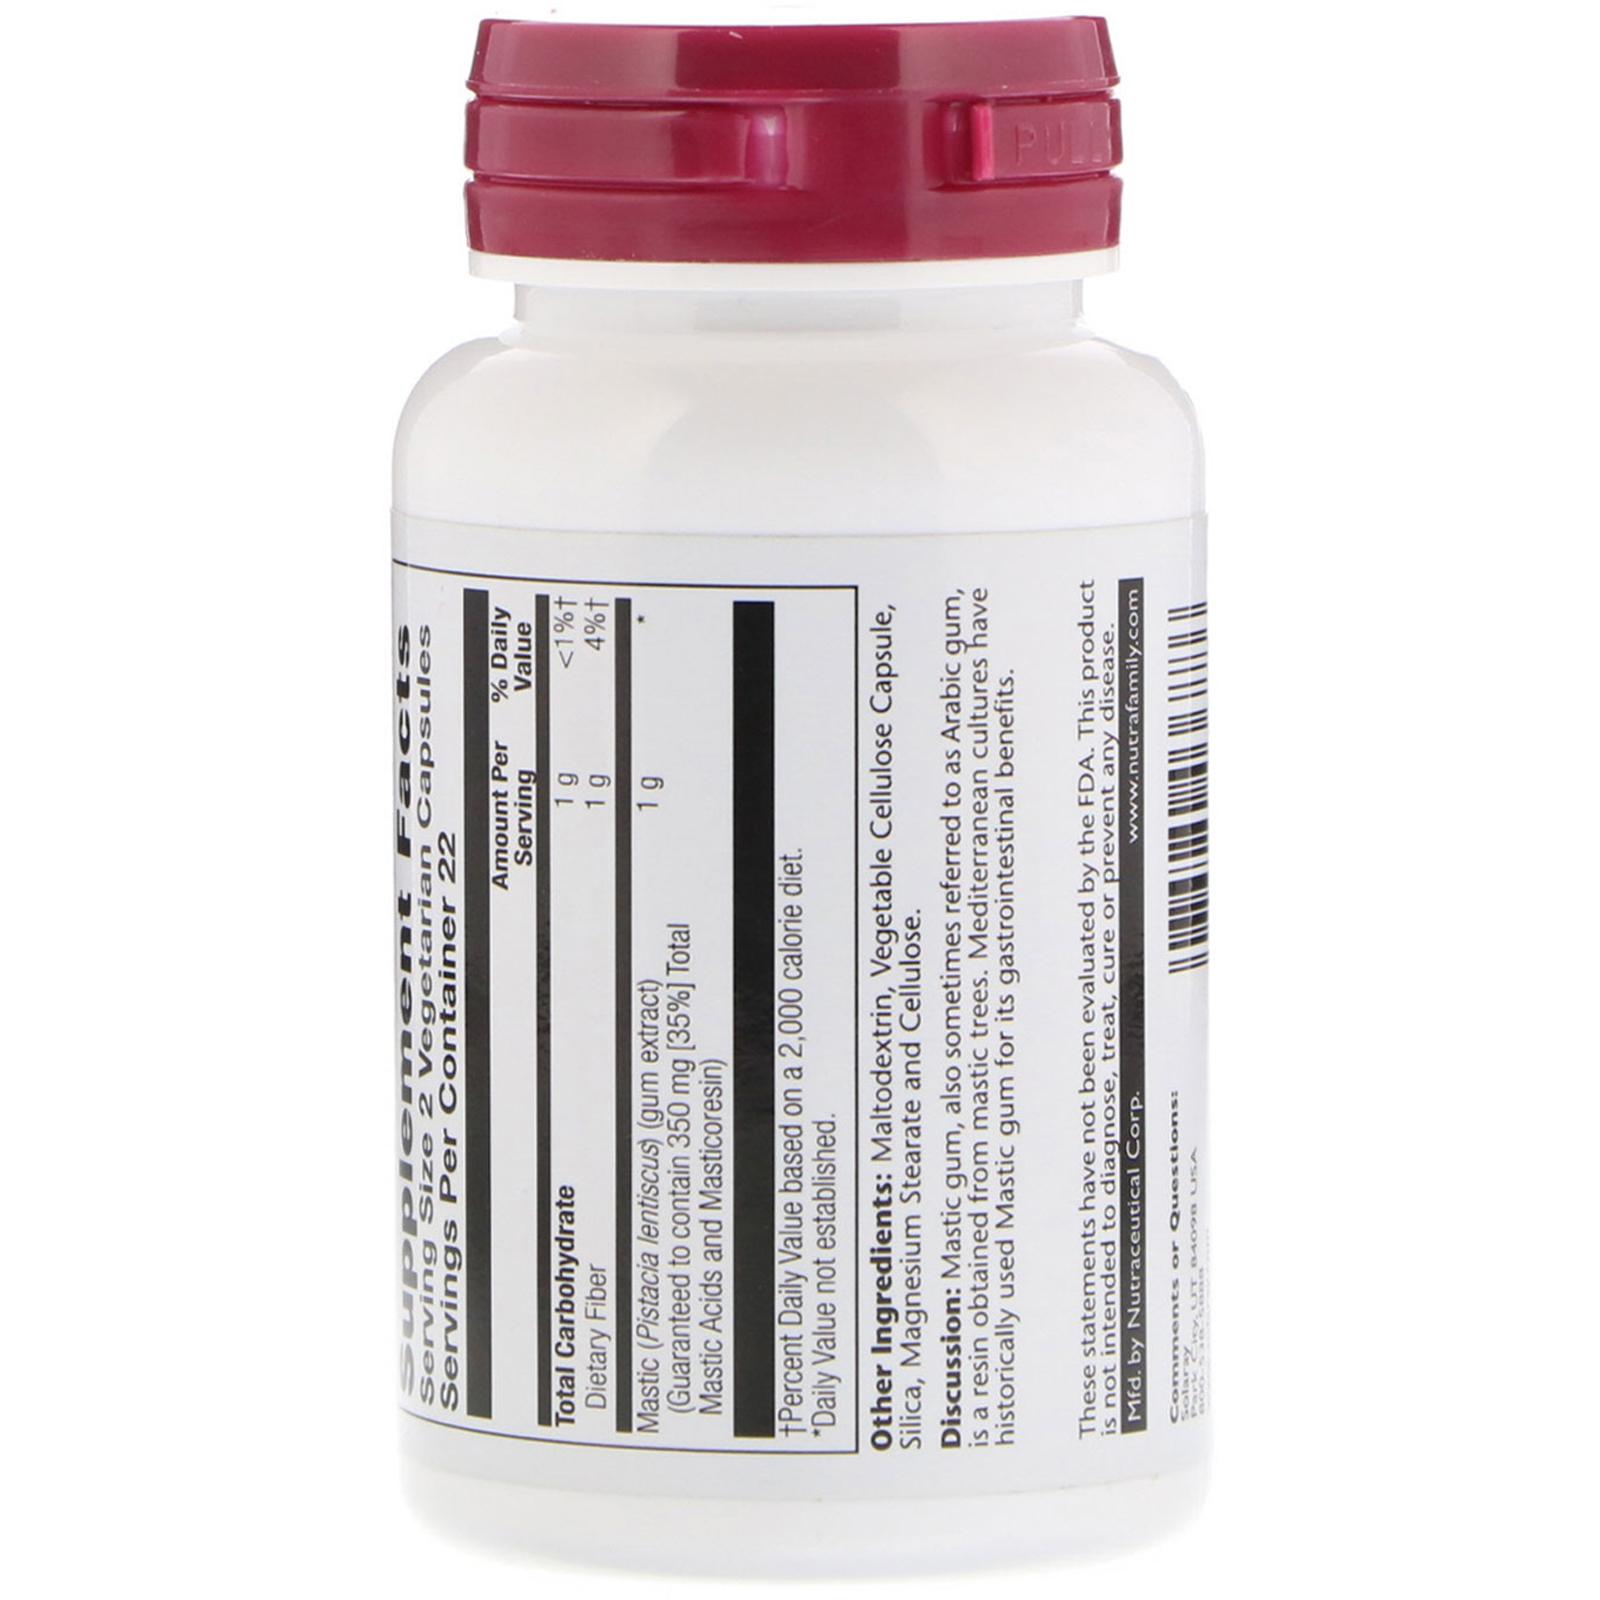 Solaray, Mastic Gum Extract, 500 mg, 45 Vegetarian Capsules - iHerb com